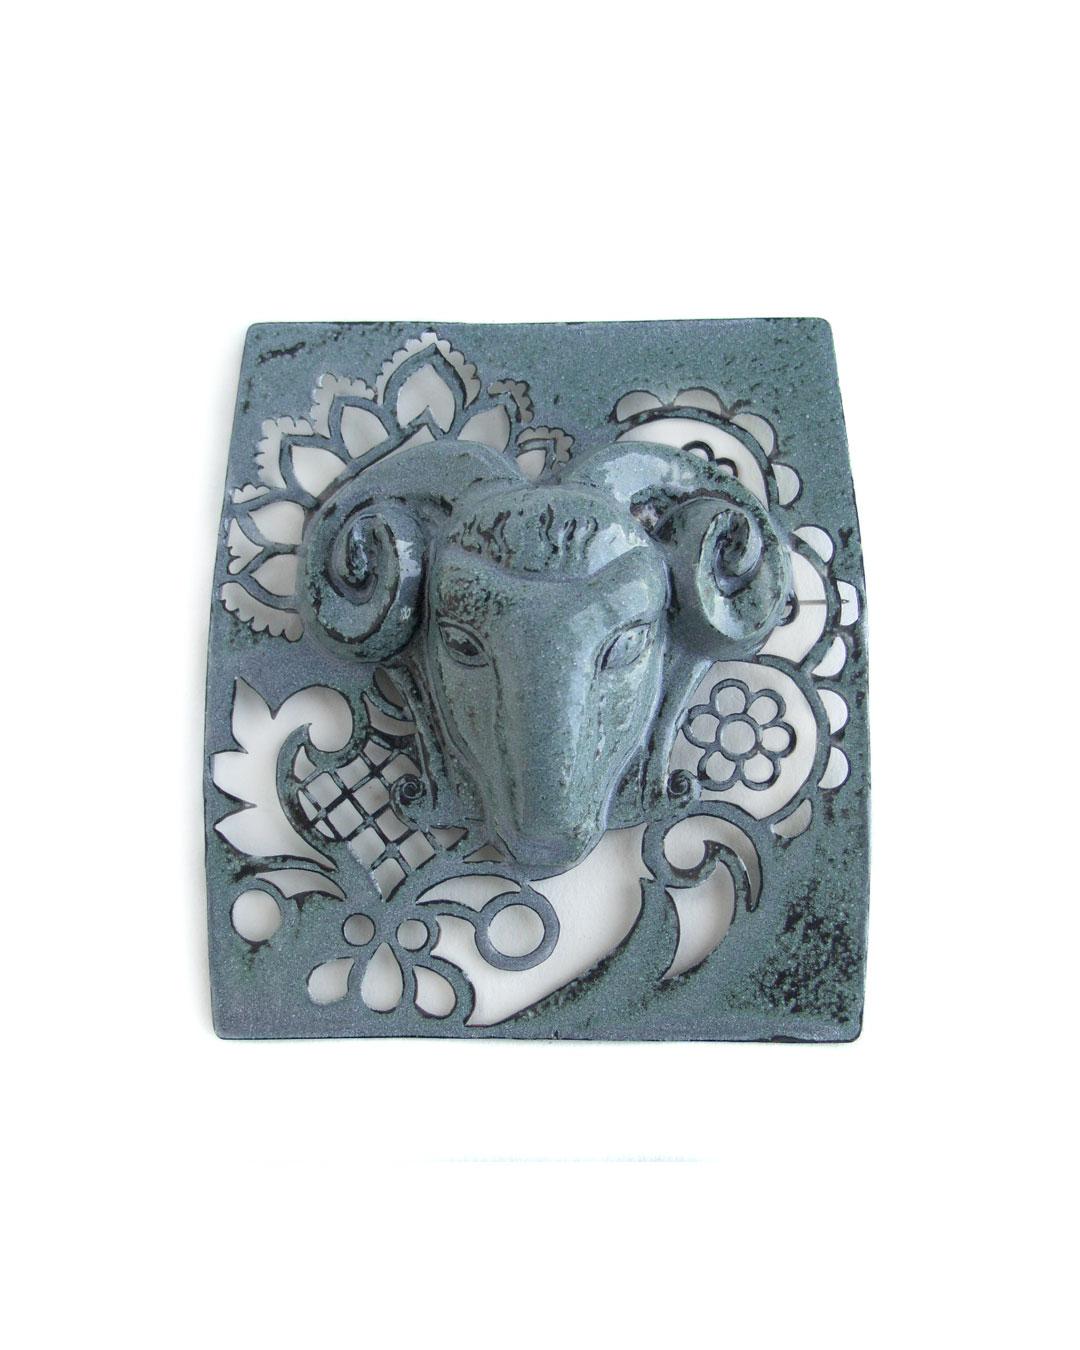 Vera Siemund, untitled, 2005, brooch; enamel, copper, 60 x 59 x 20 mm, €1550